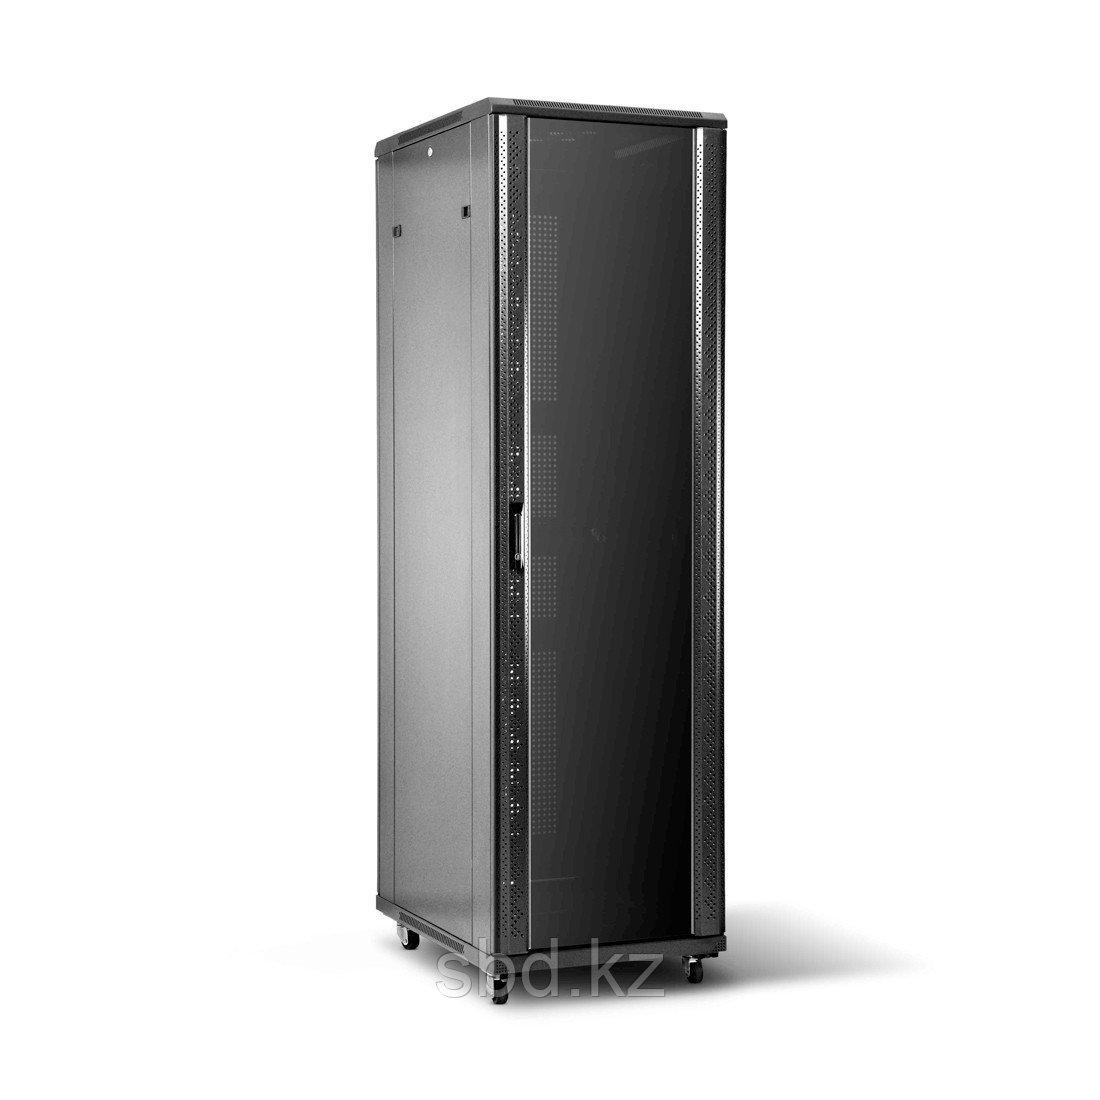 Шкаф серверный SHIP 601S.6642.24.100 42U 600*600*2000 мм